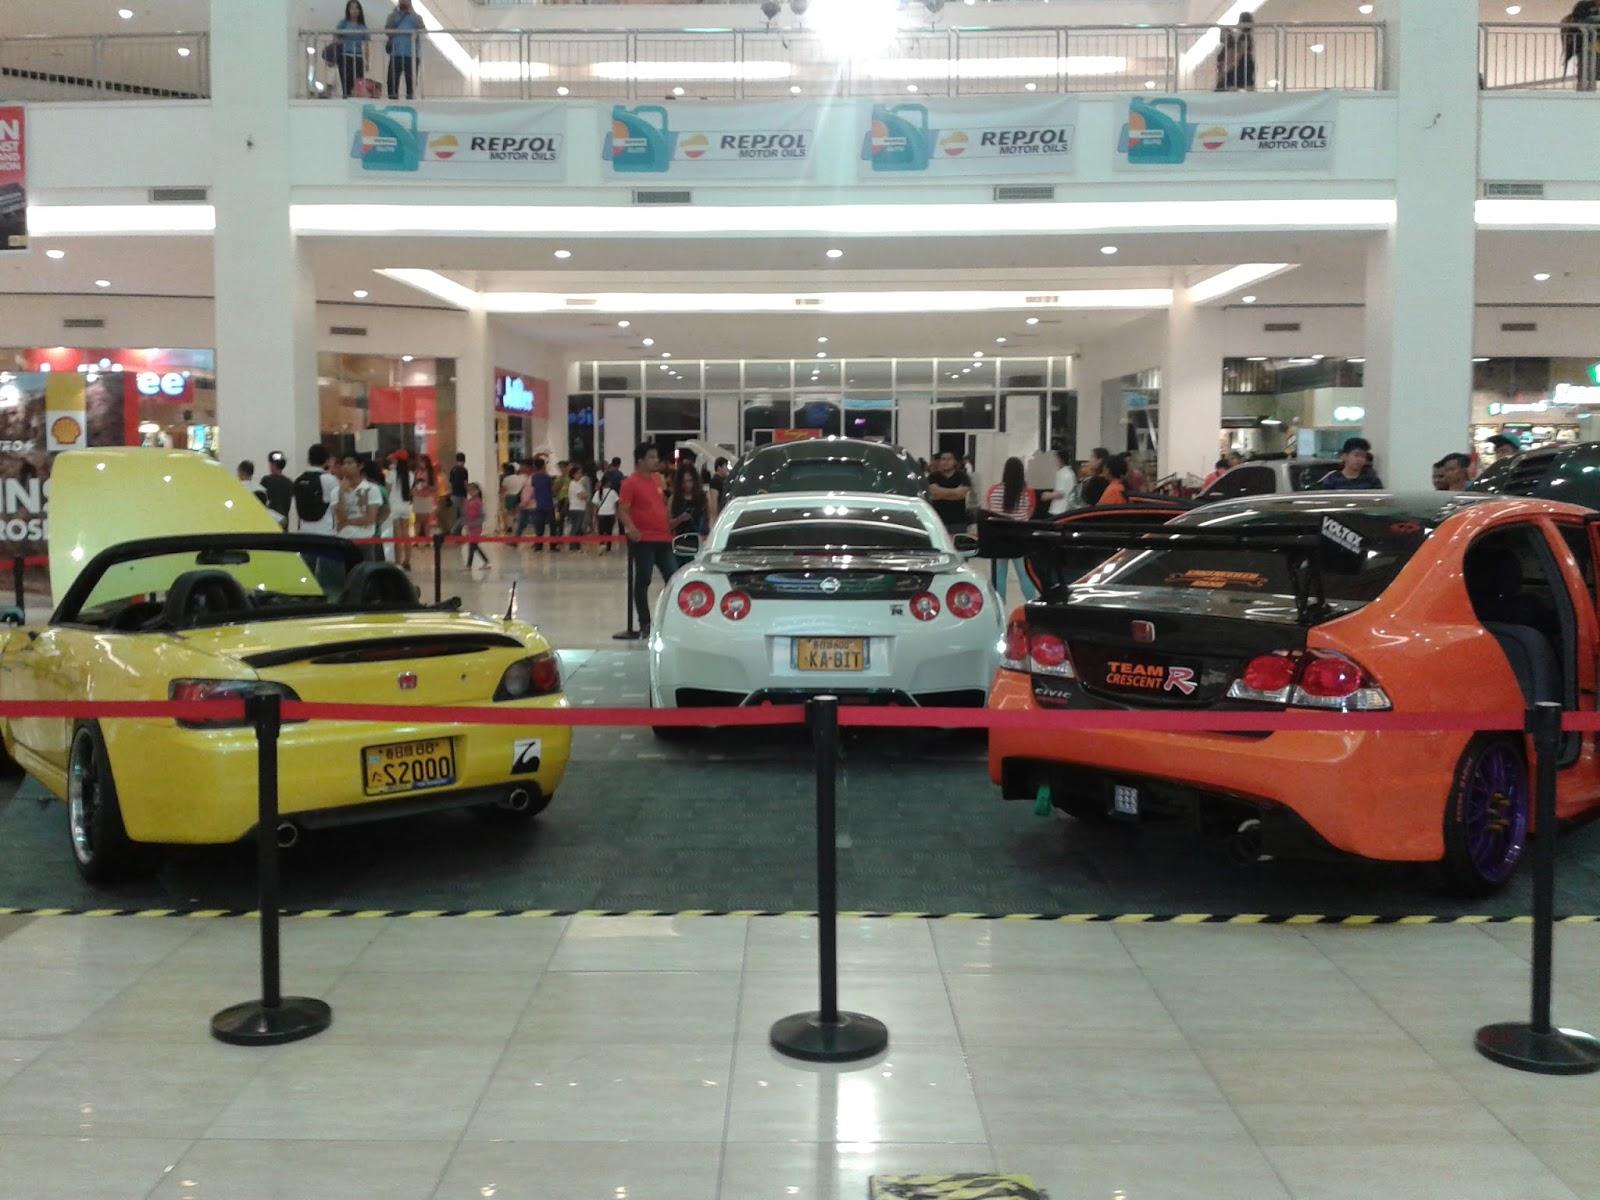 Sports Car Fanatic Tagum City Car Show - Find car shows